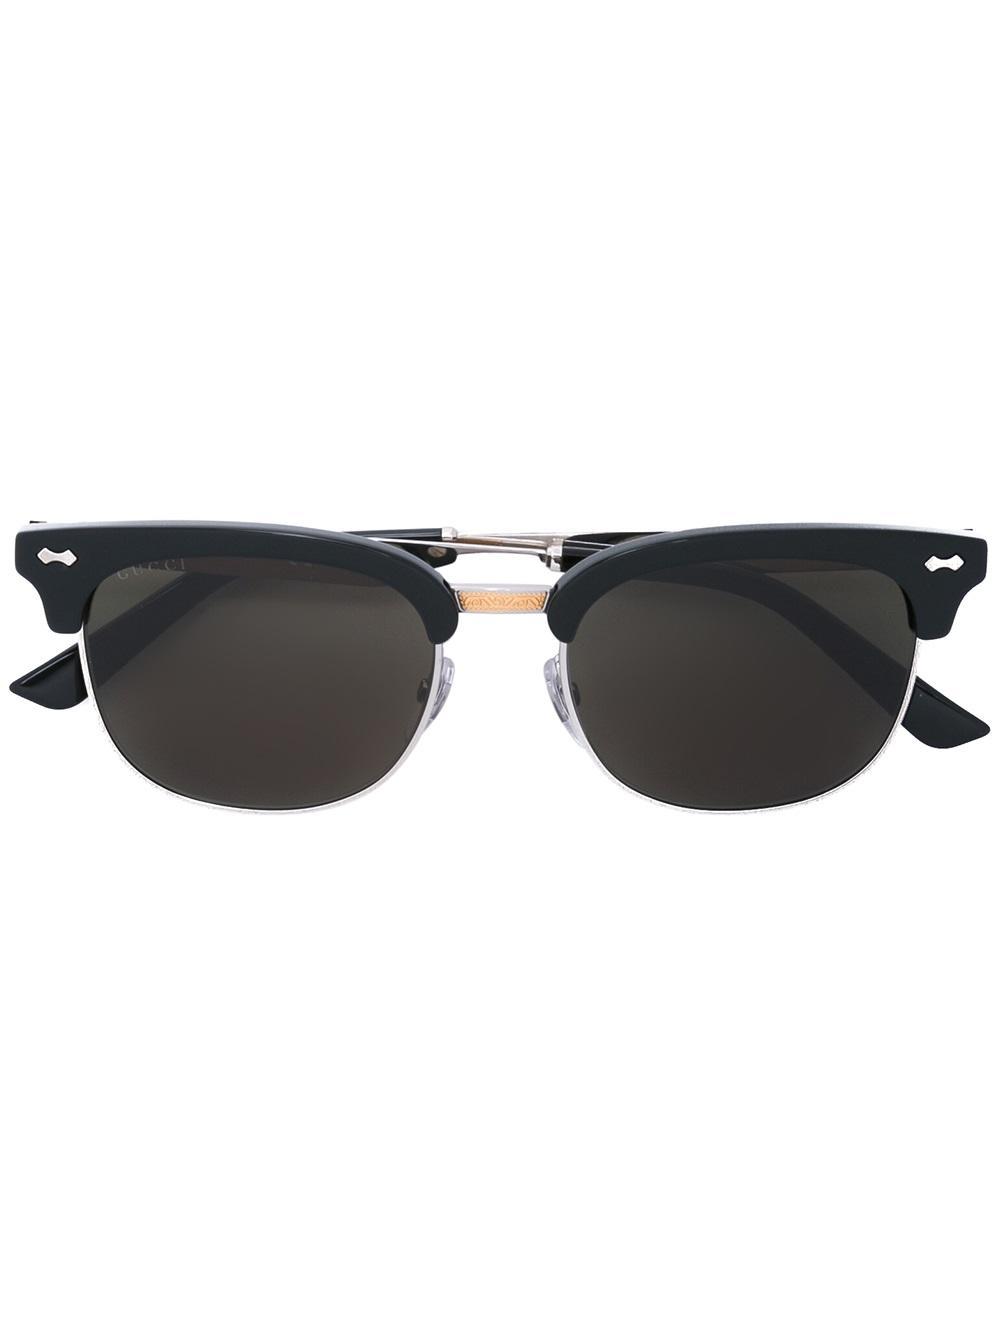 8cf0151980c4f lunette Gucci solde homme